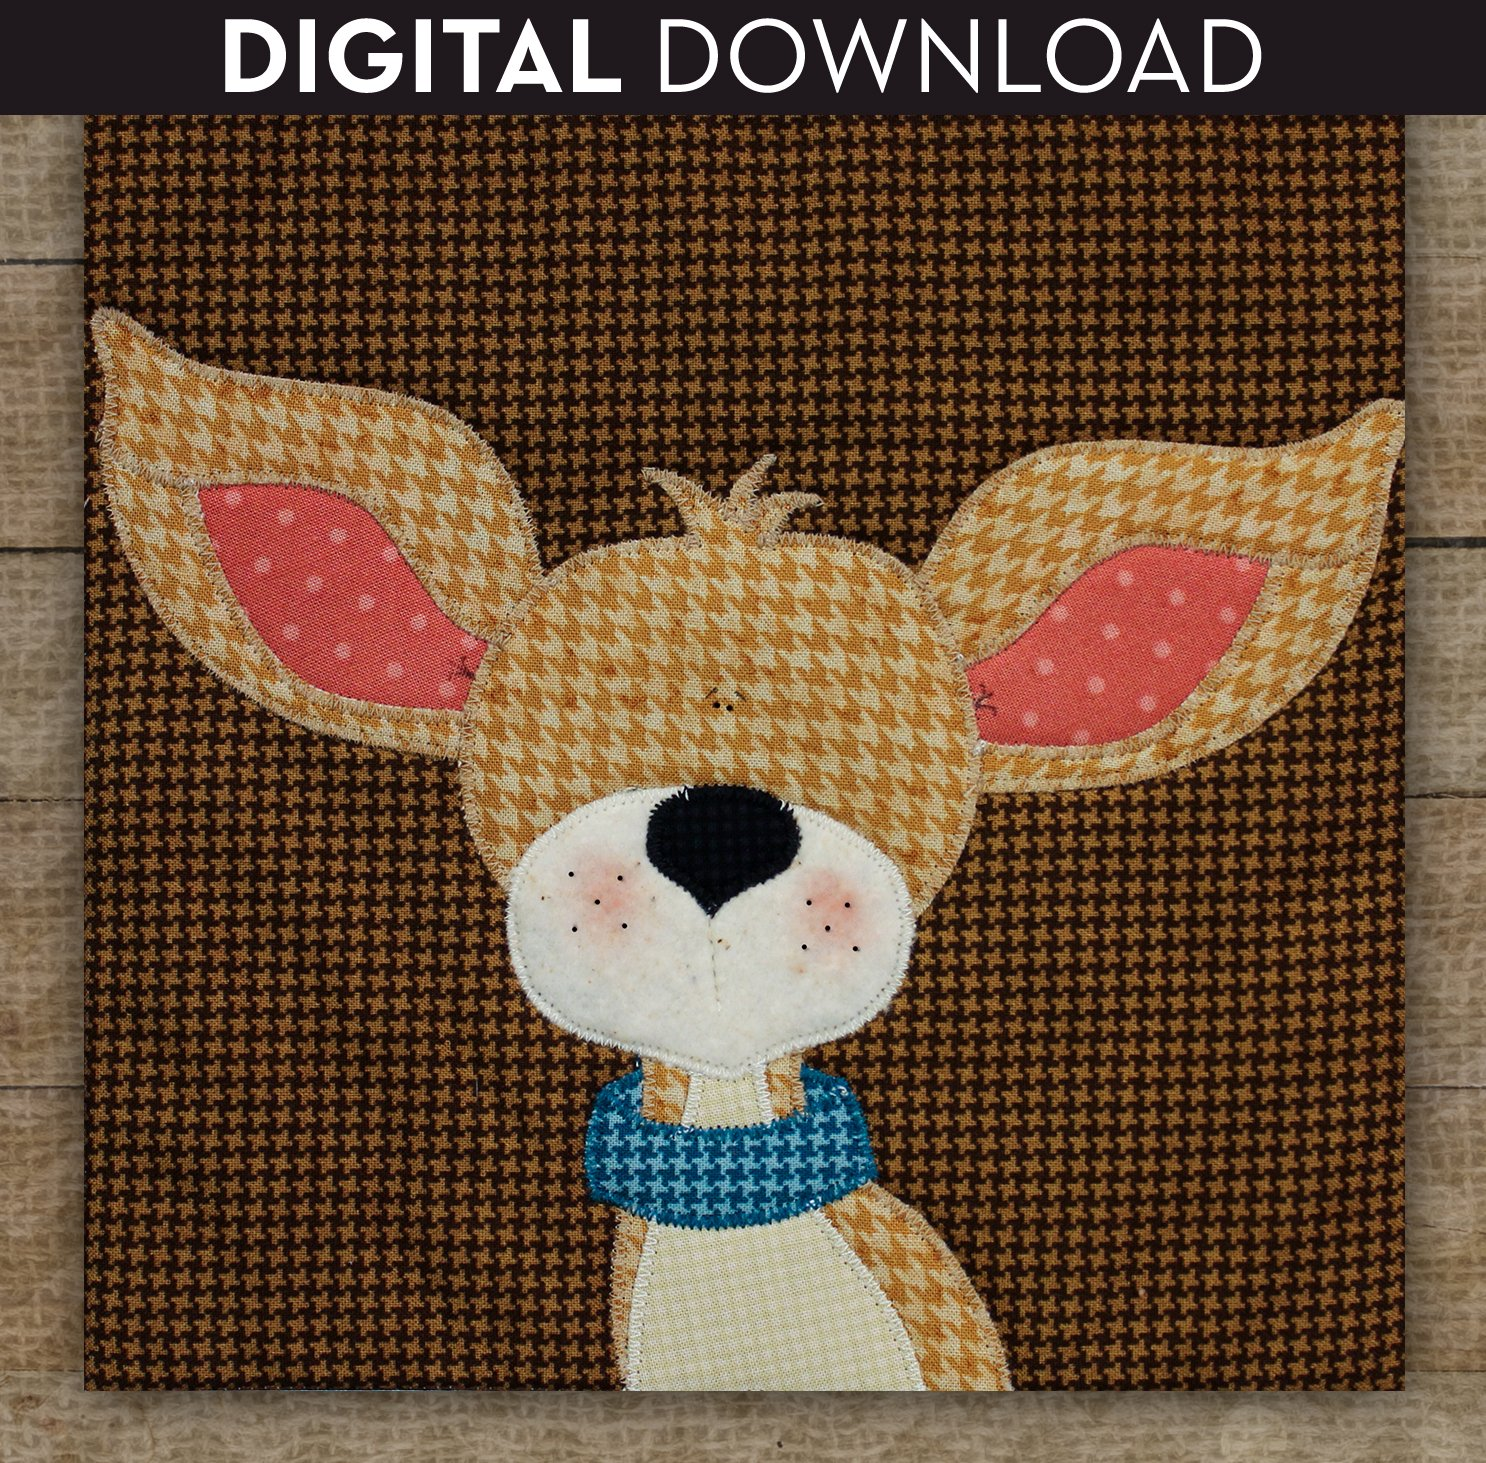 Chihuahua - Download